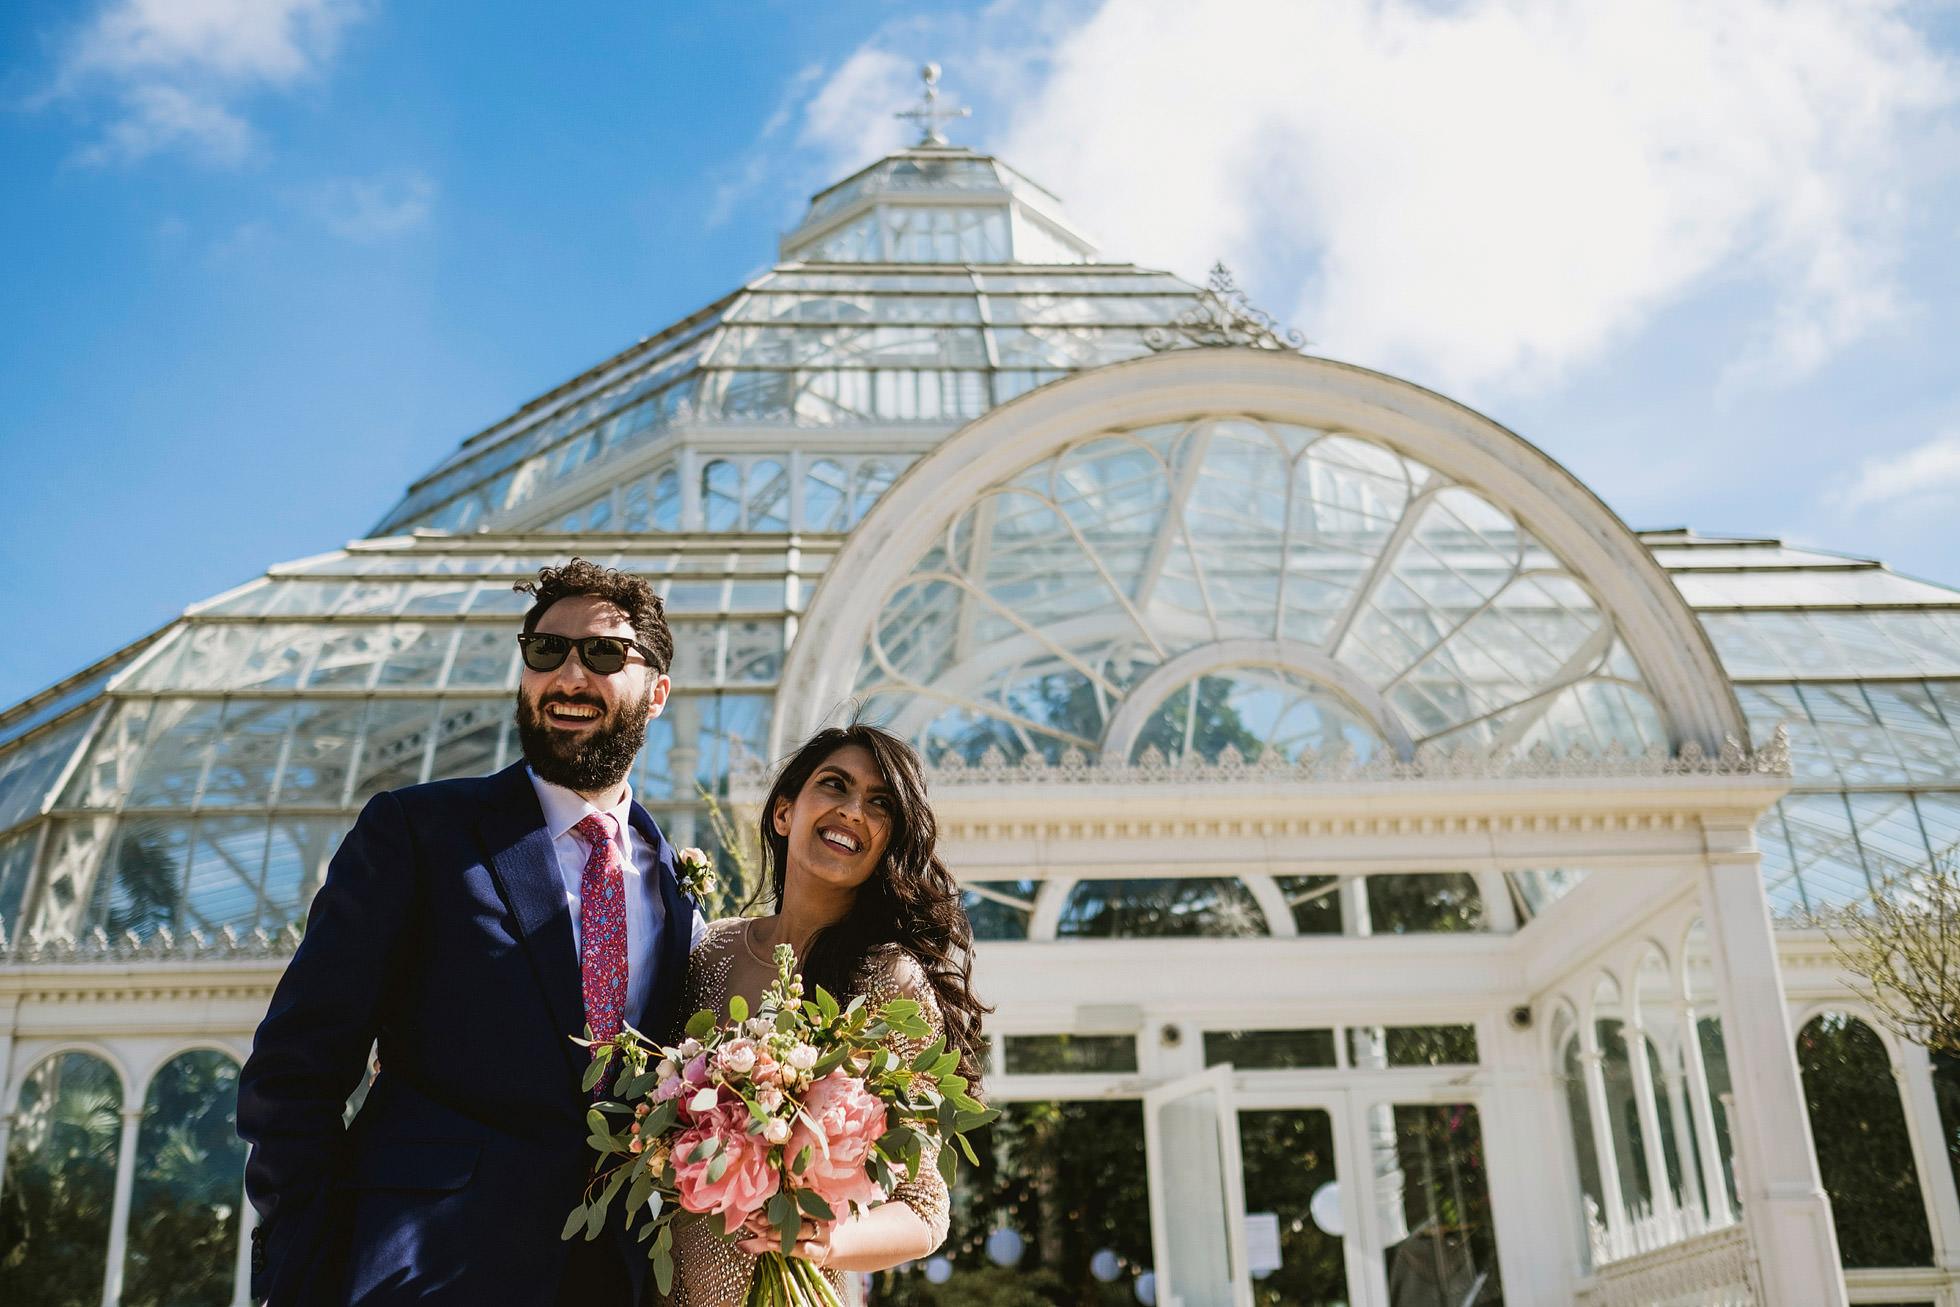 titanic hotel sefton park palm house wedding photography